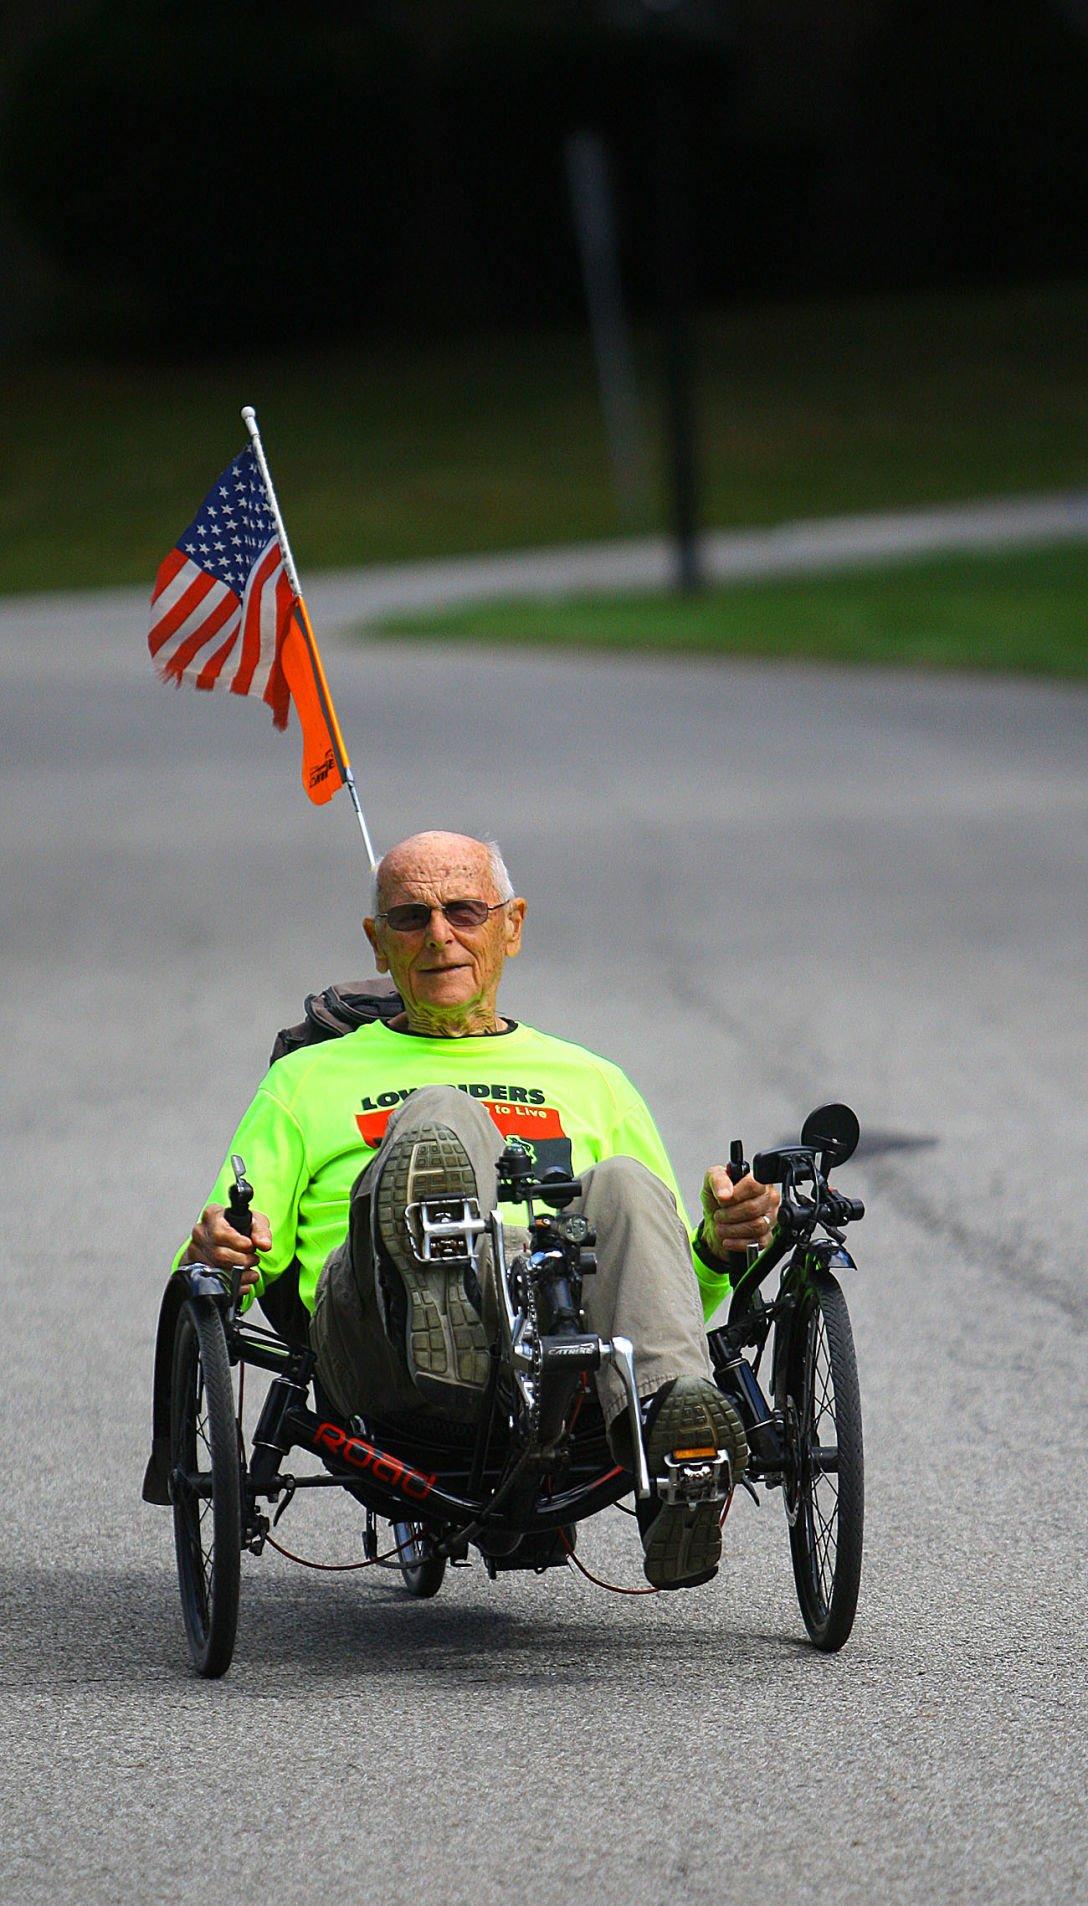 87 year-old biker 03.jpg